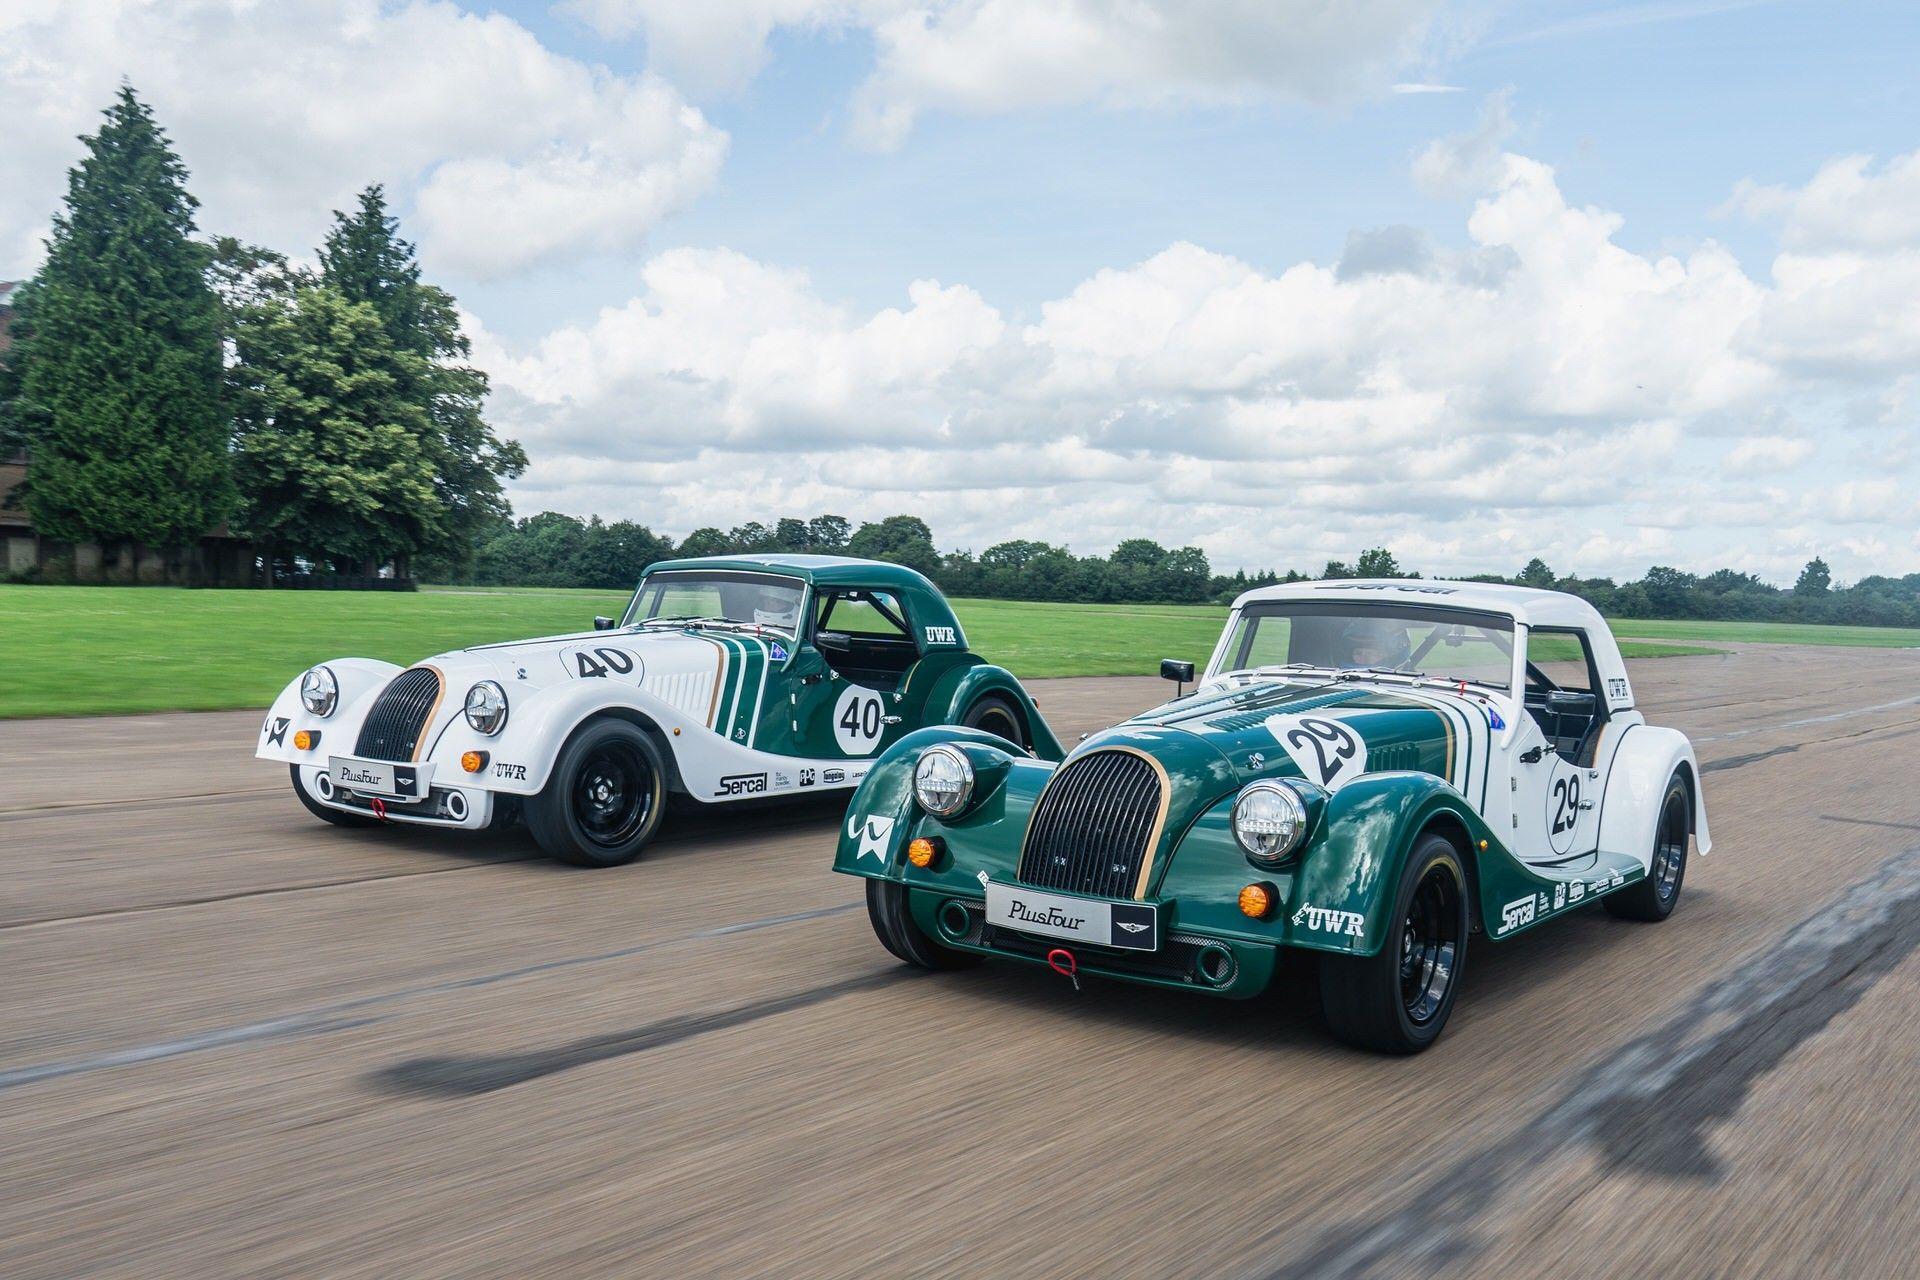 Morgan_Plus_Four_race_cars-0008